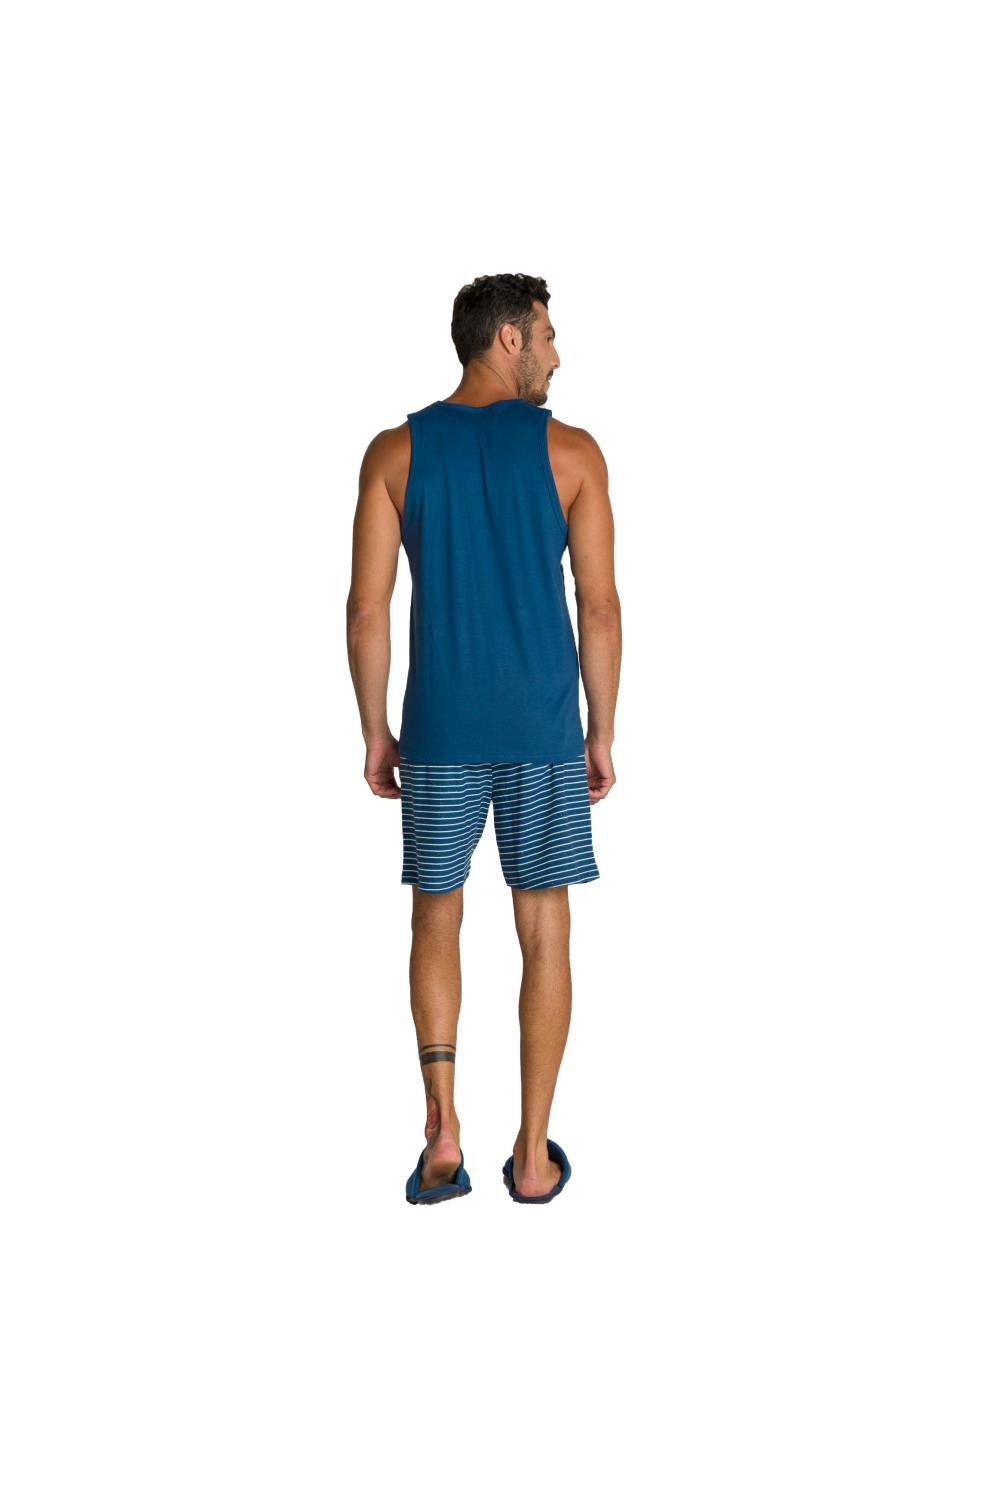 007/G - Pijama Adulto Masculino Regata e Bermuda Botonê